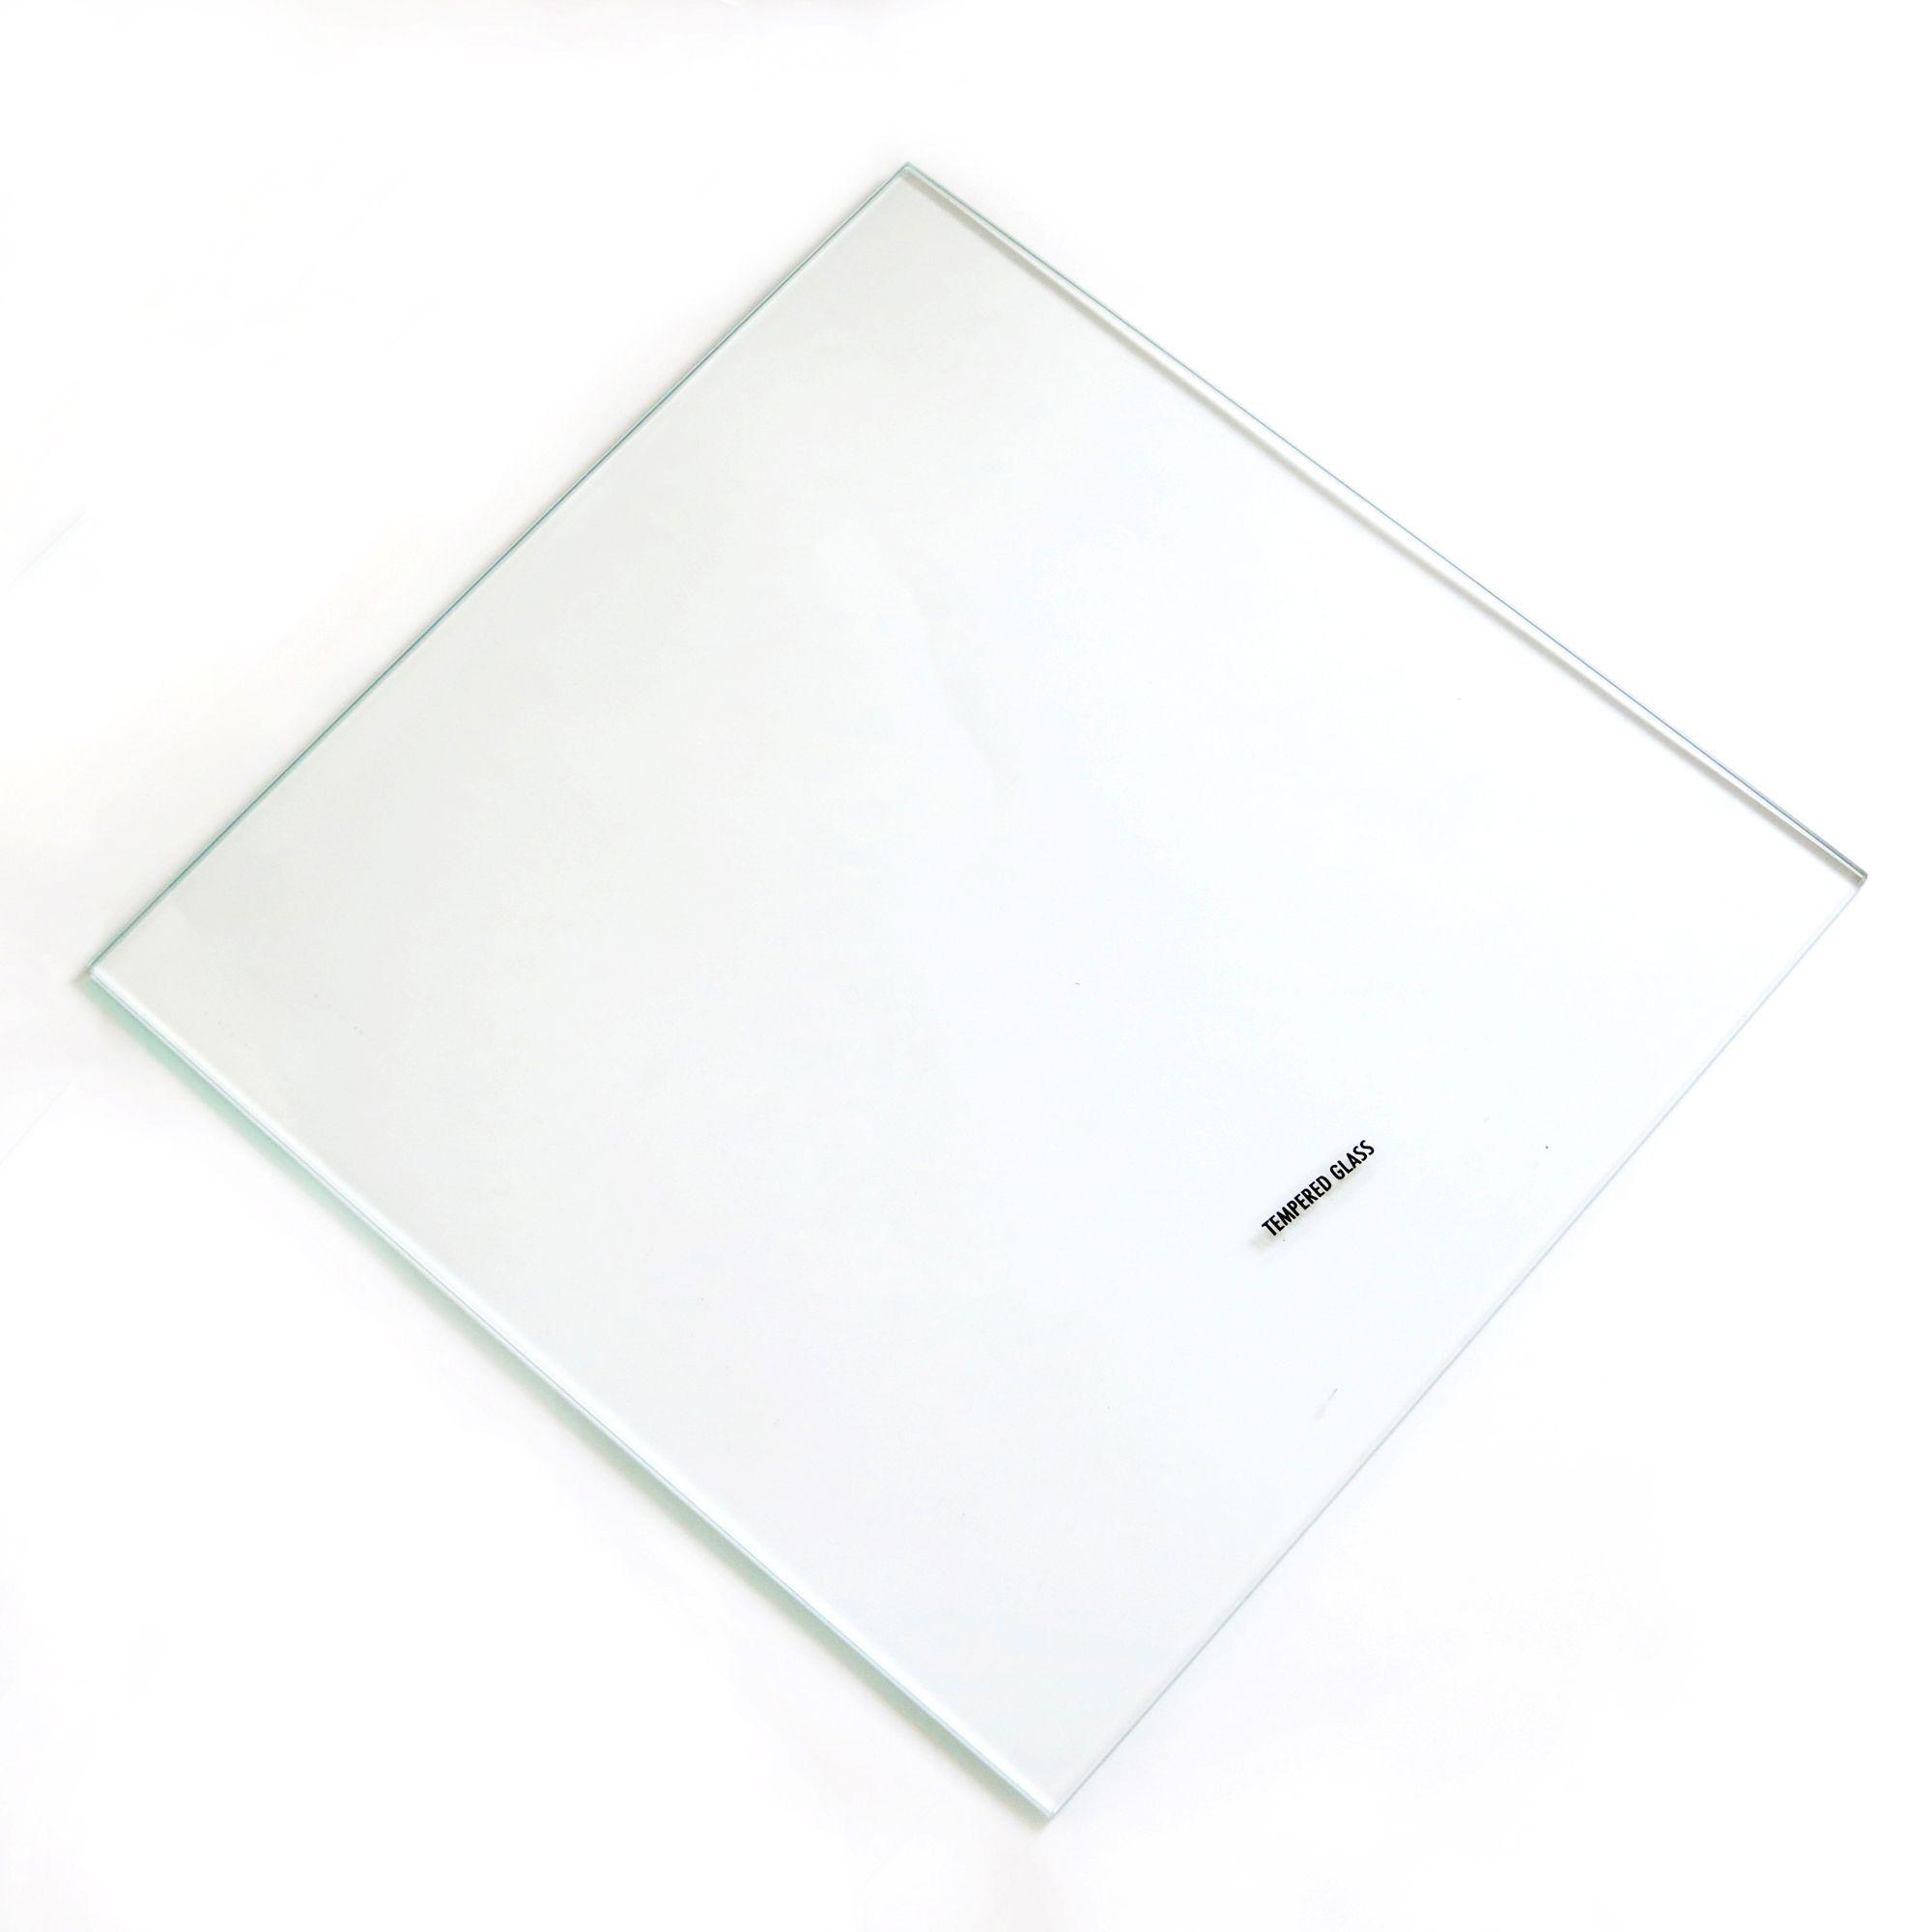 Clear Internal Glass Kitchen Cabinet Shelves (l)258mm (d)247mm, Pack Of 2